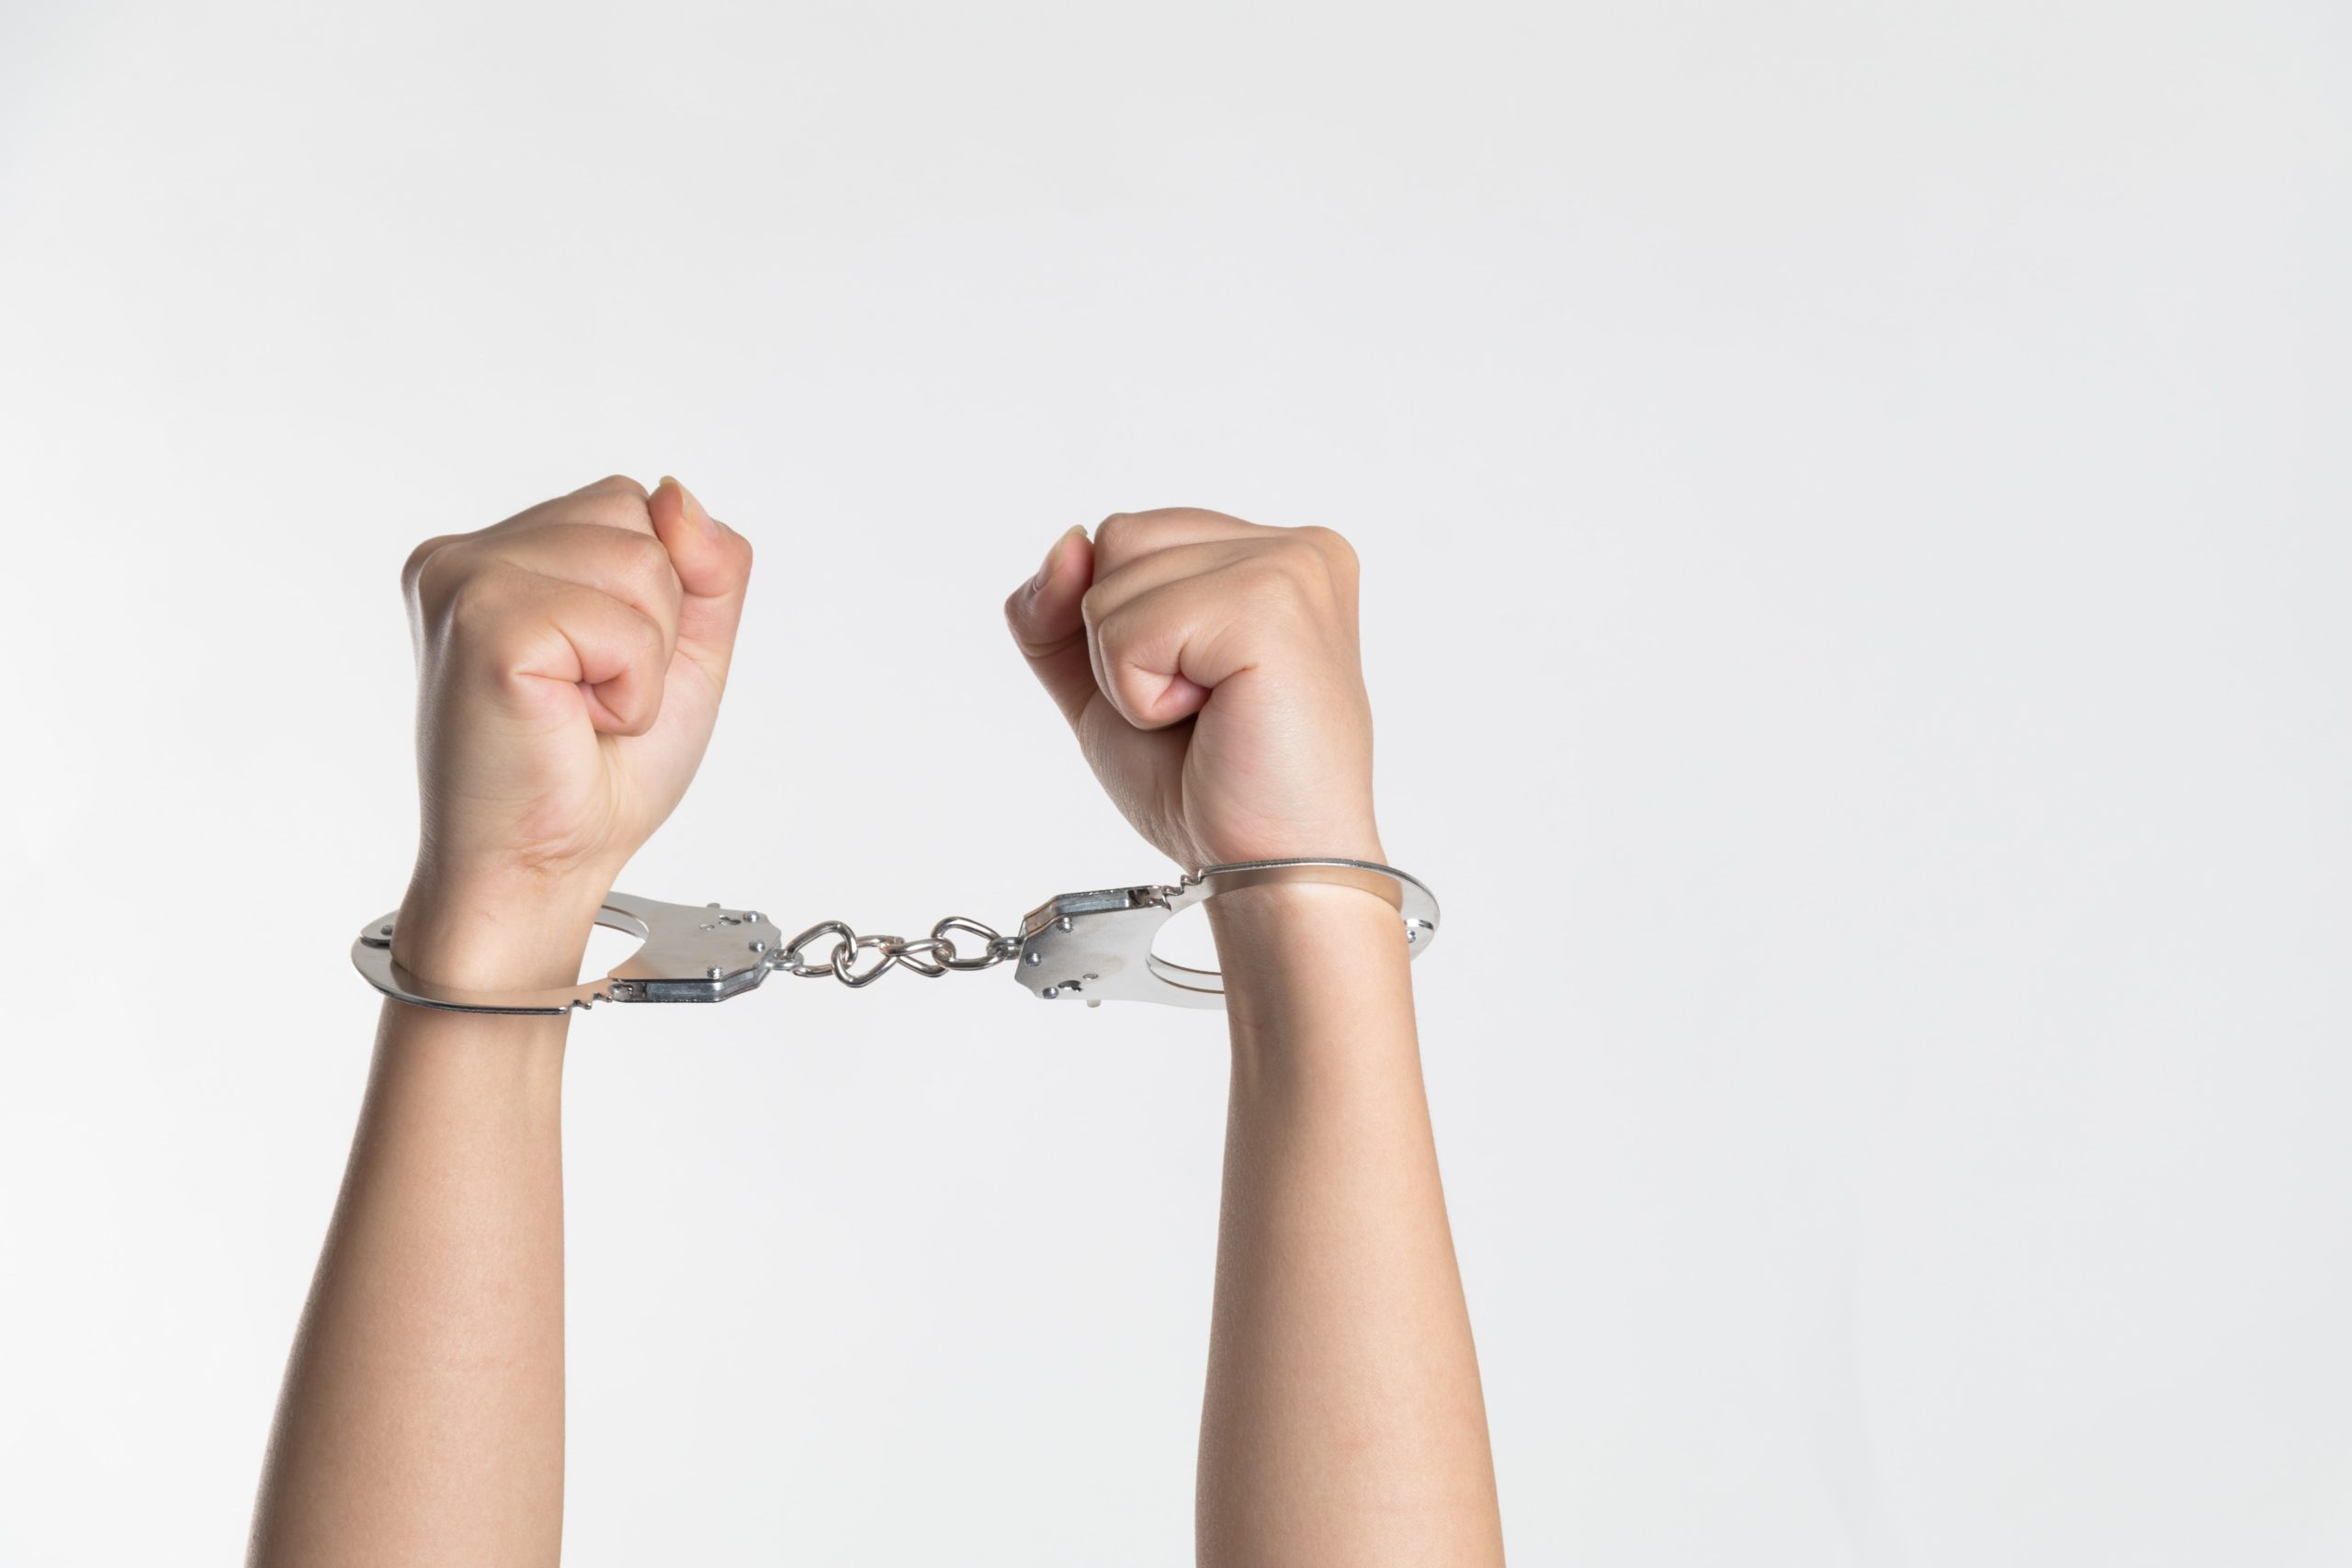 arrested handcuffs